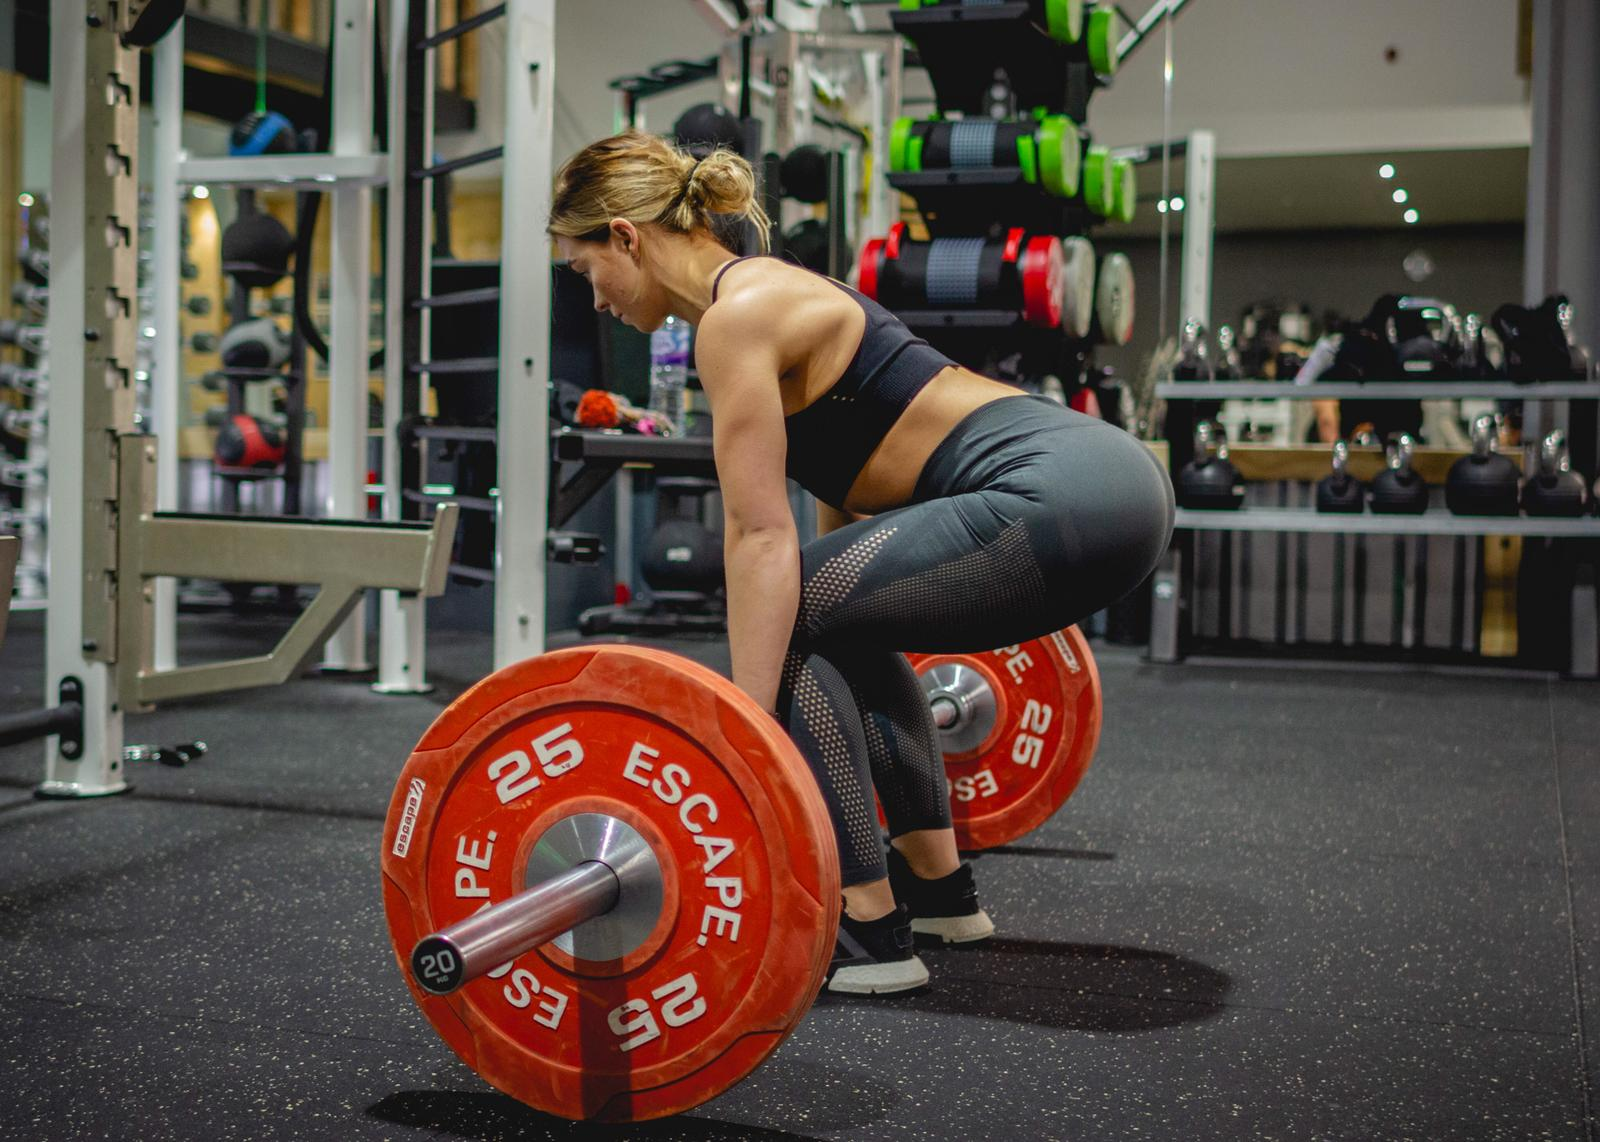 Female trainer performing deadlift